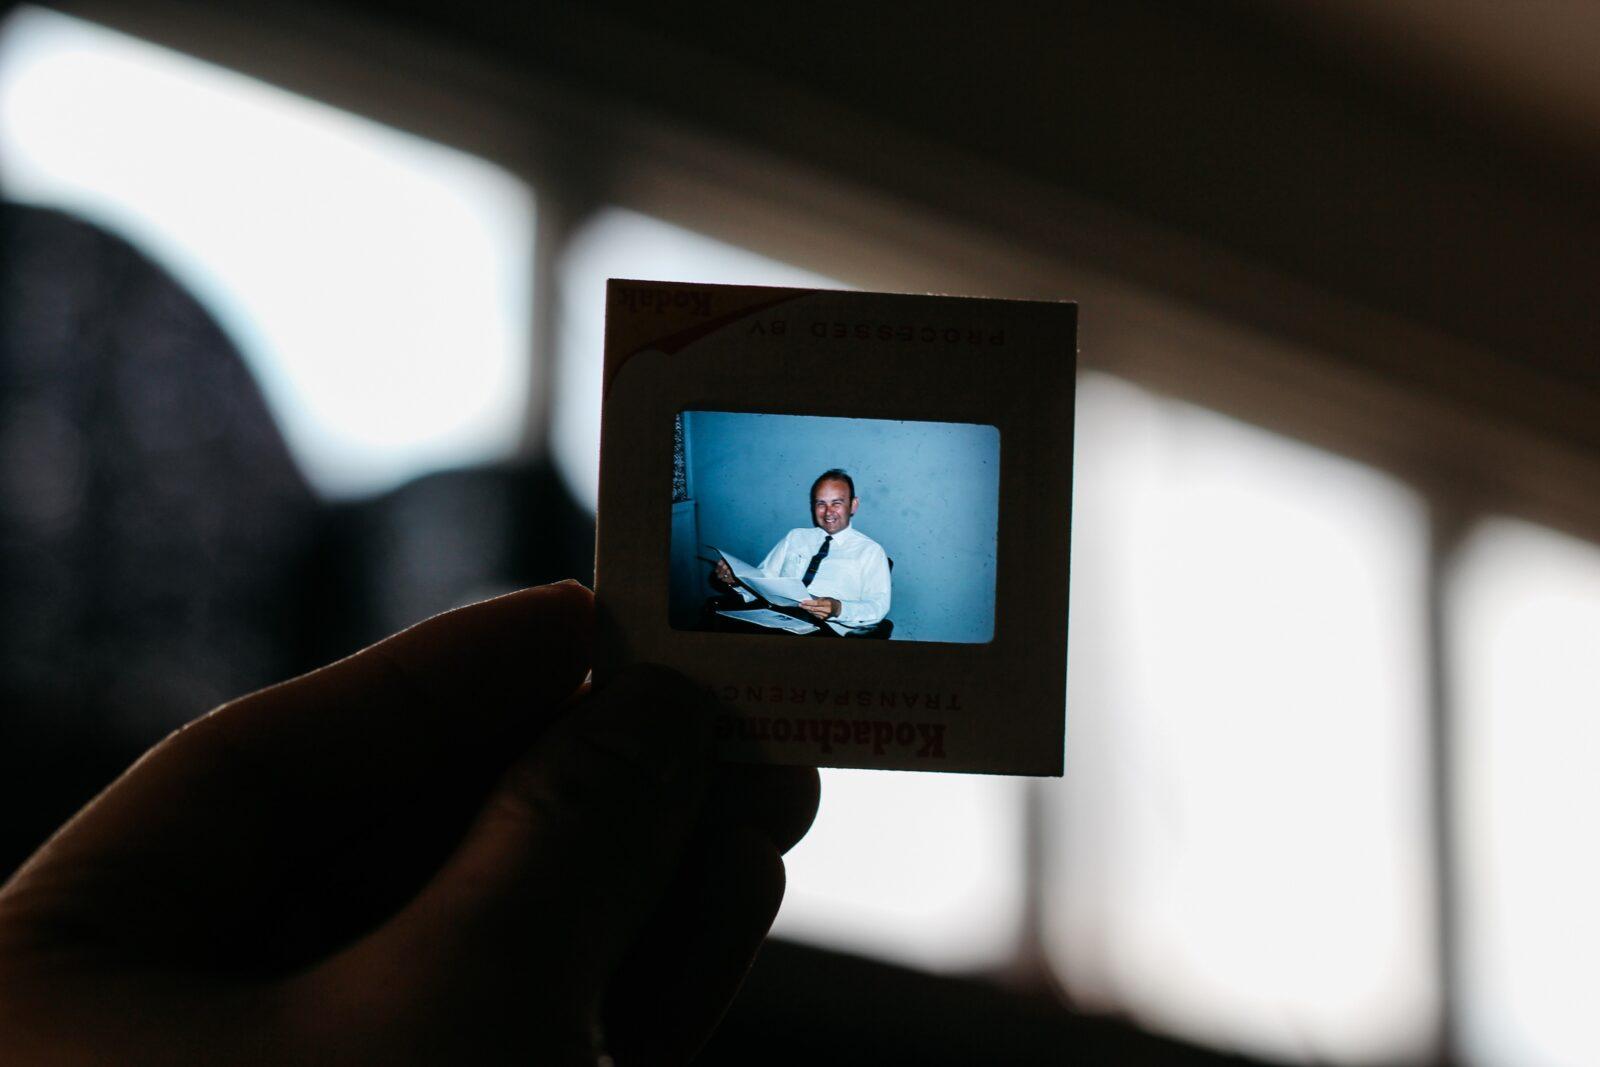 Bildoptimierung polaroid photo